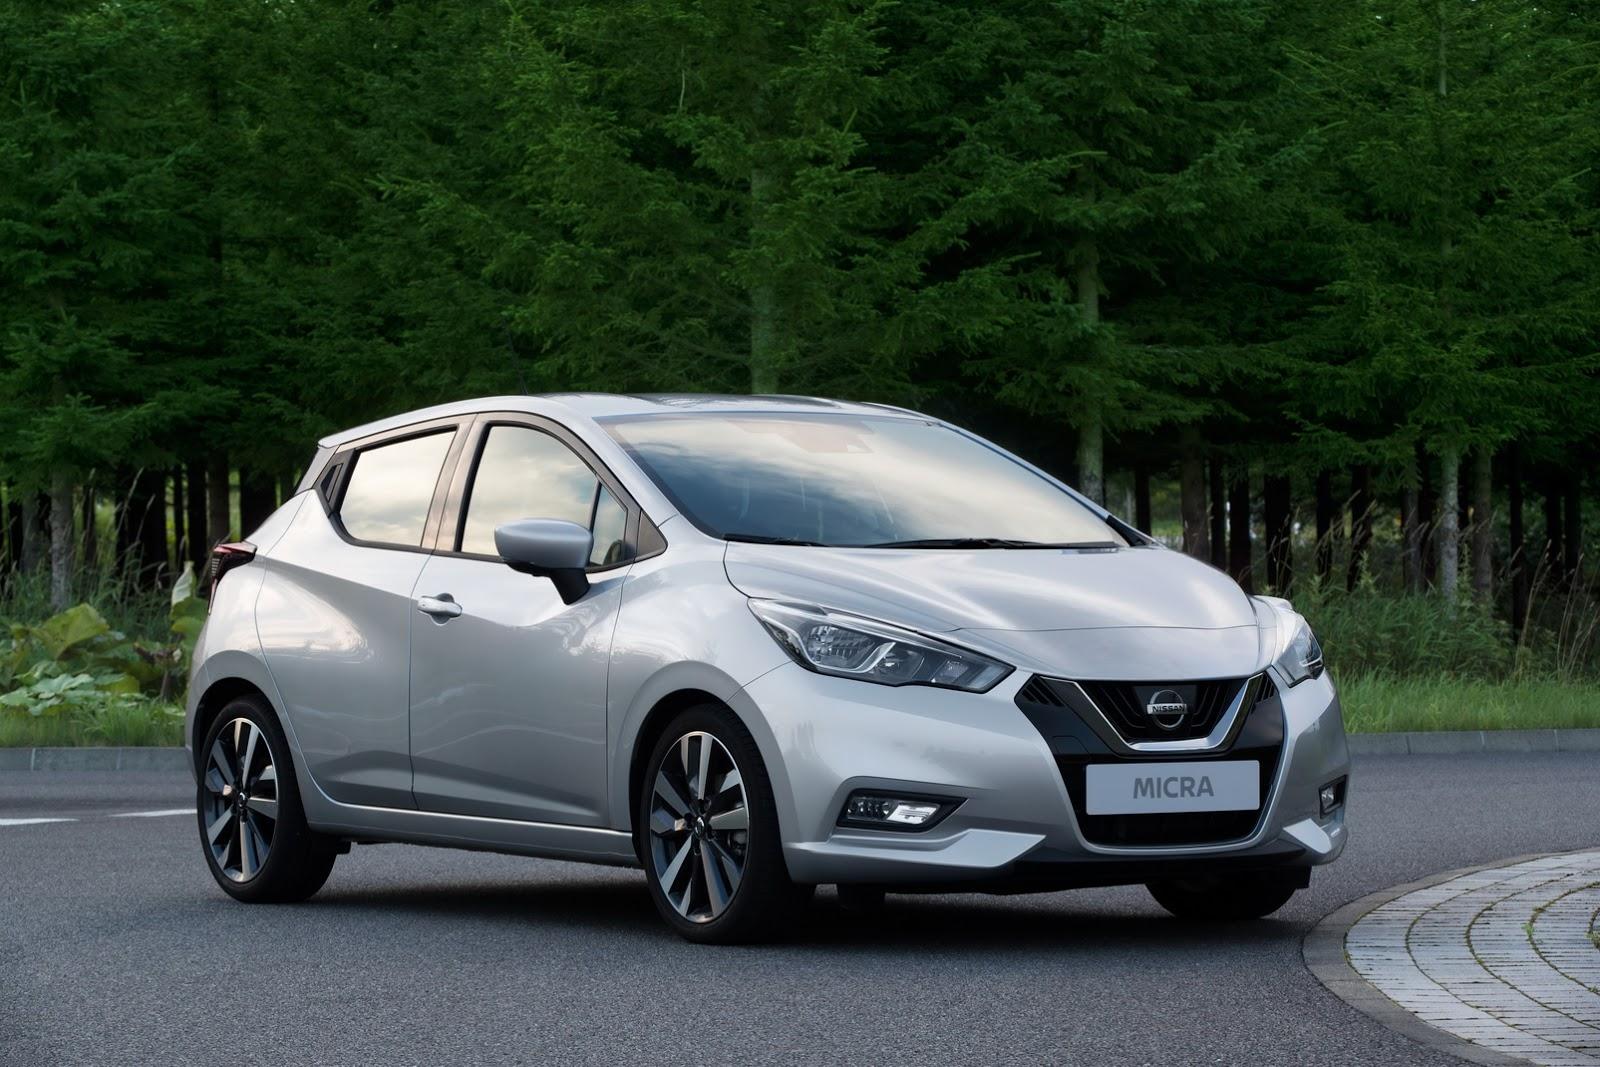 2017_Nissan_Micra_31